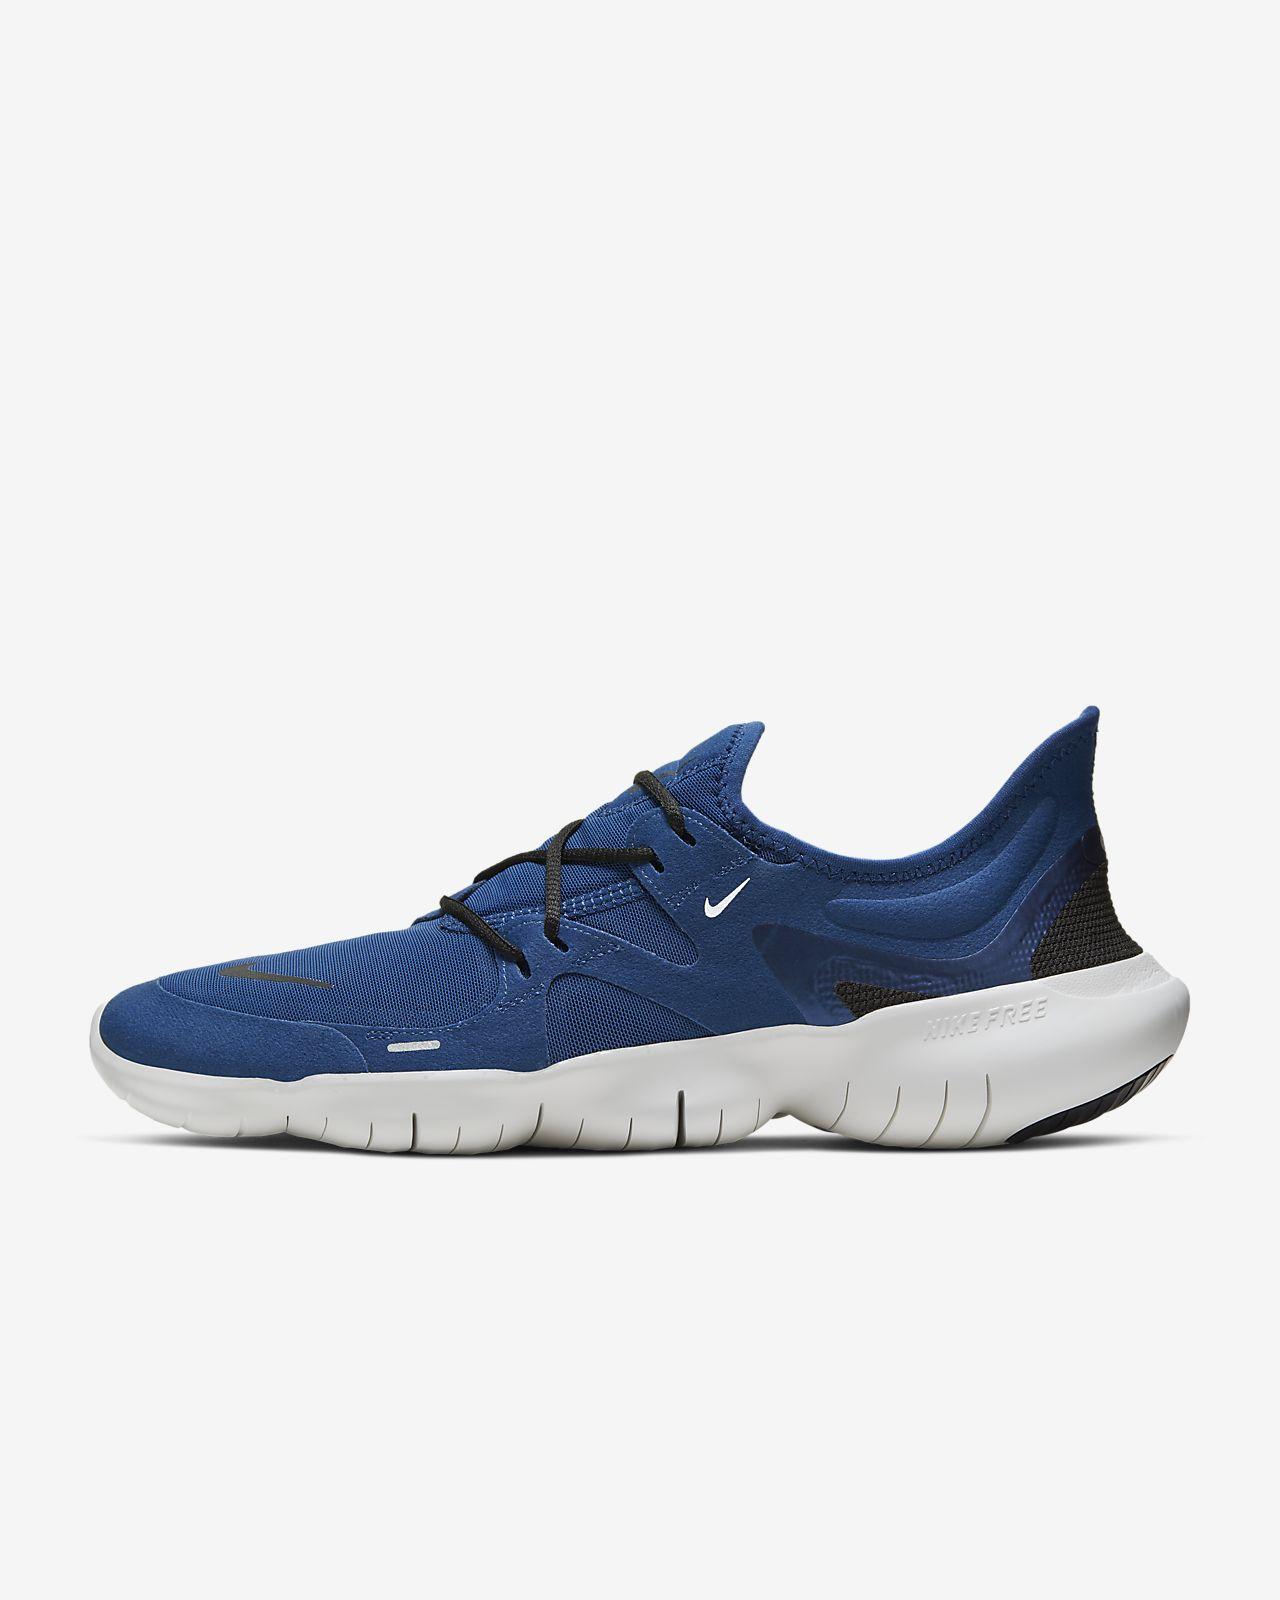 nike free run salg sort, Nike Free Run 5.0 tre Fur Sko svart